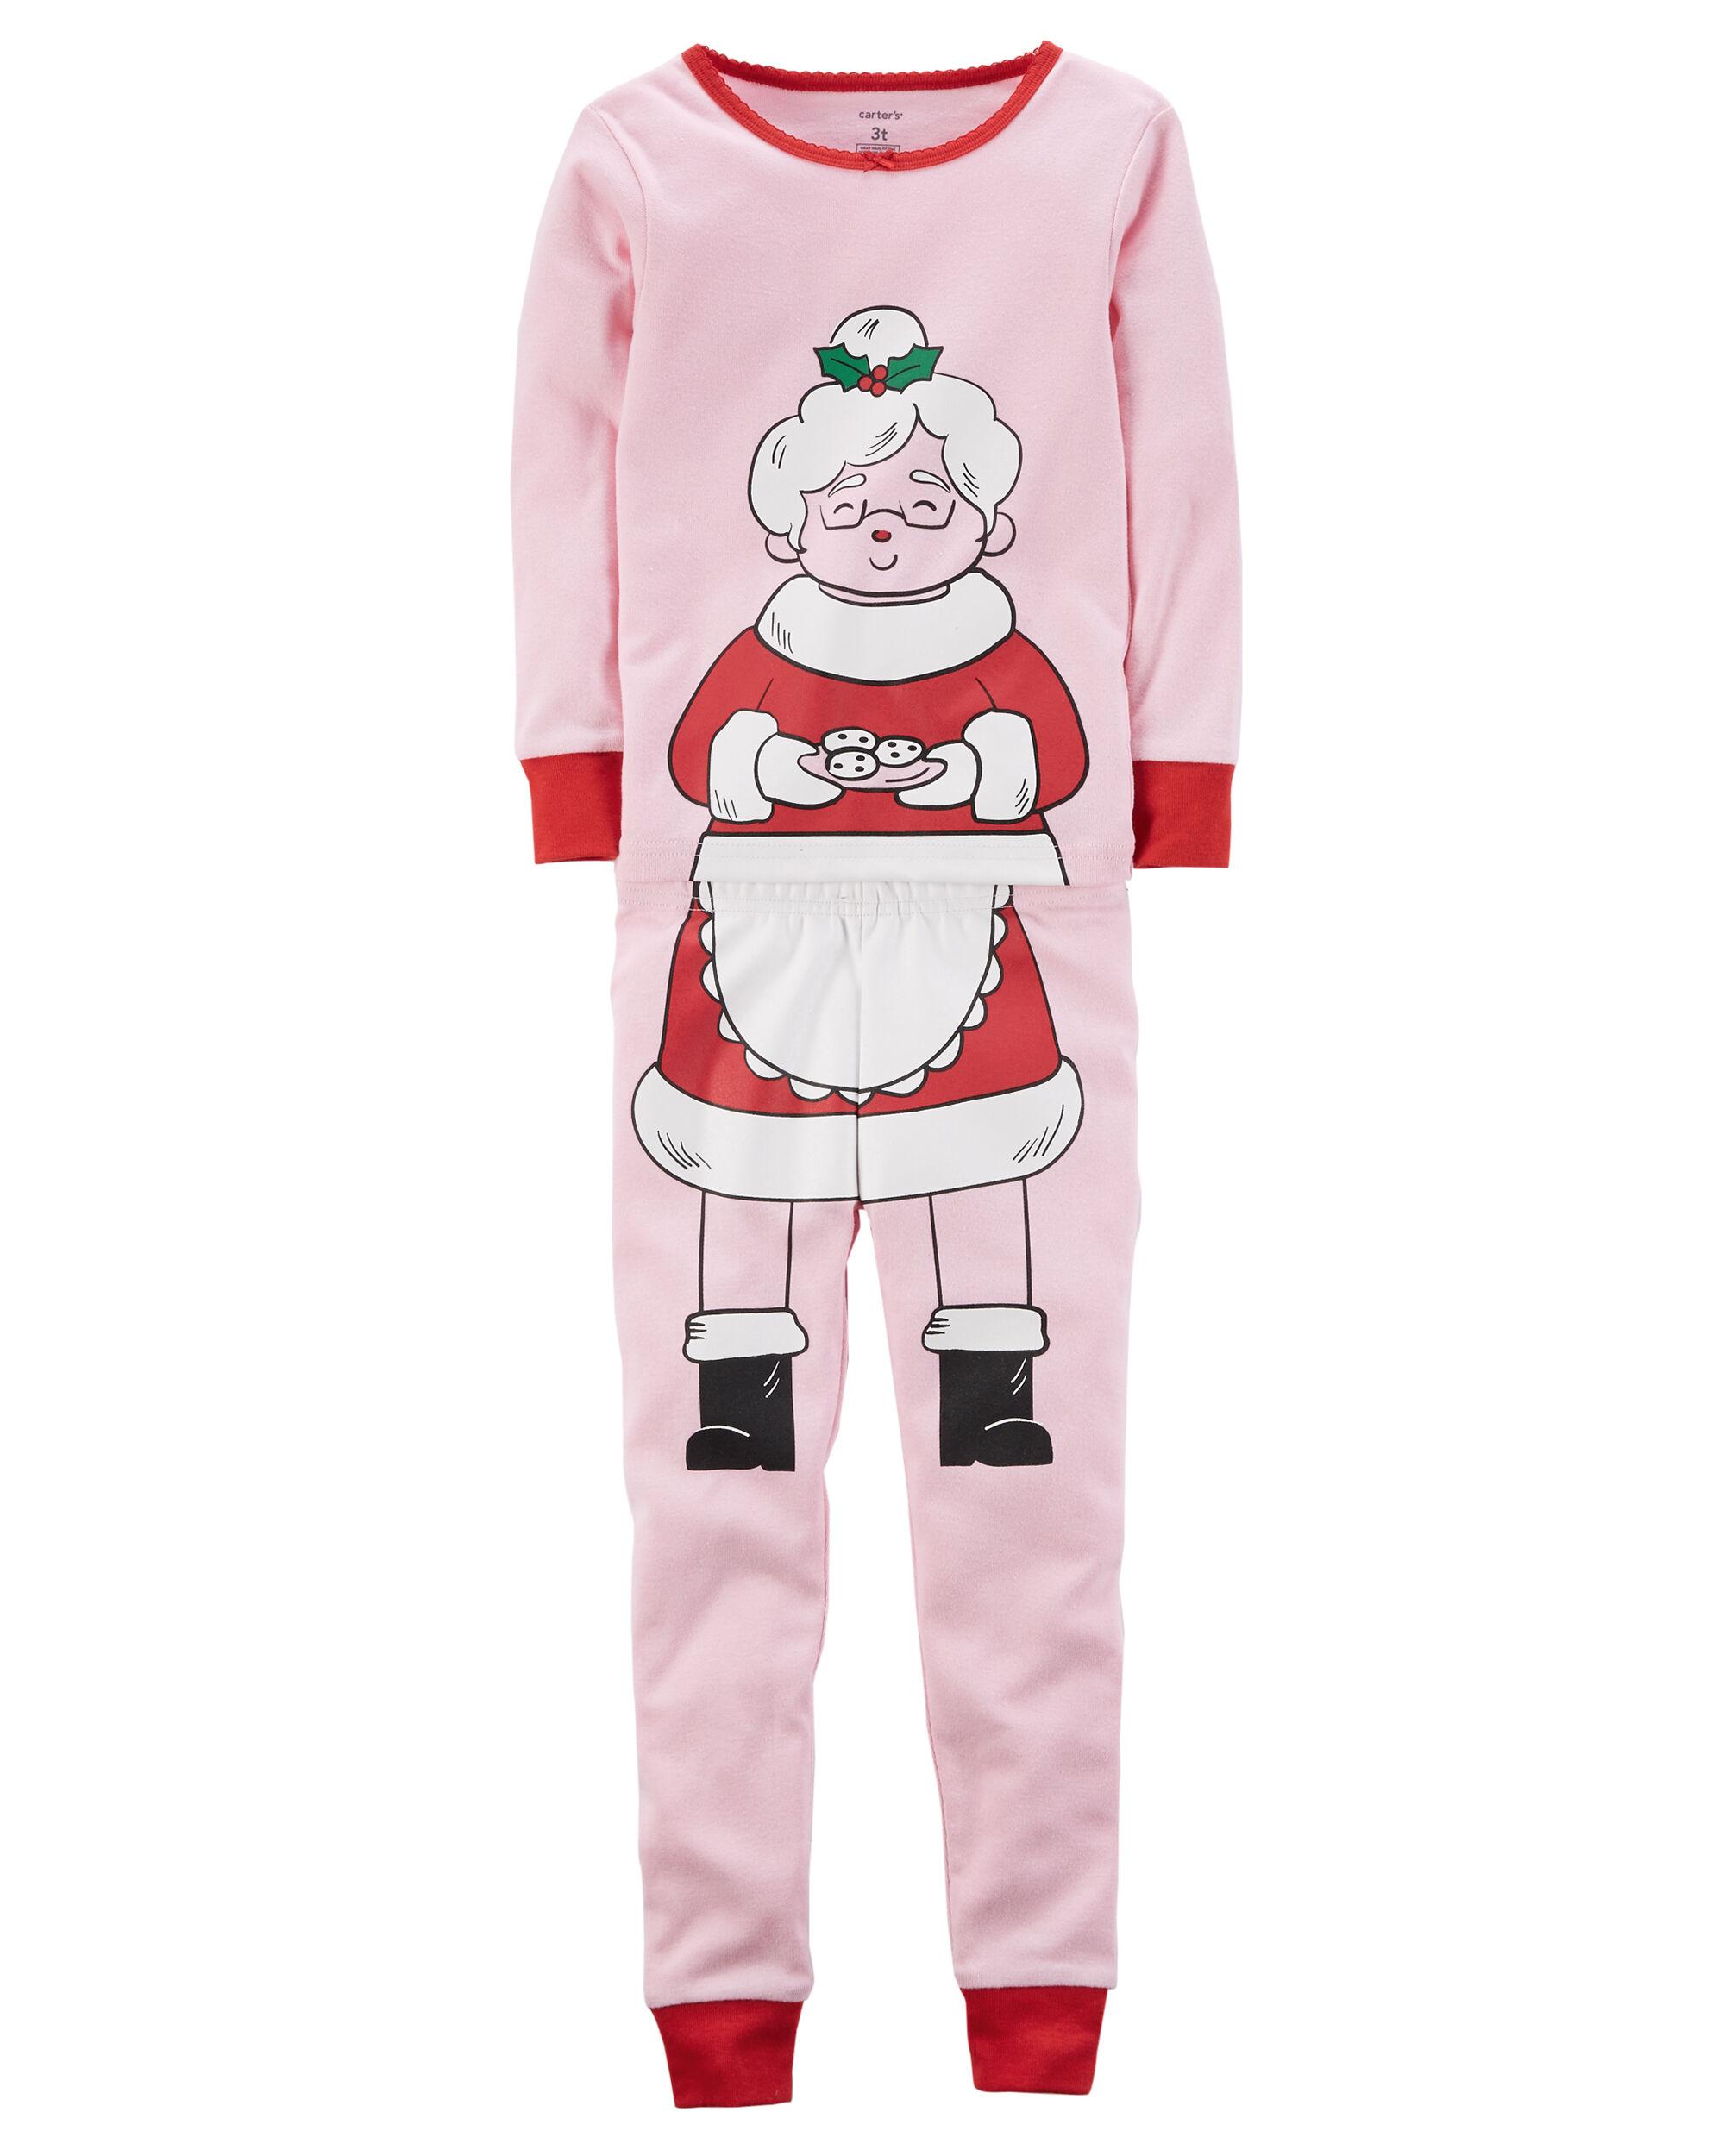 2-Piece Christmas Snug Fit Cotton PJs   Carters.com